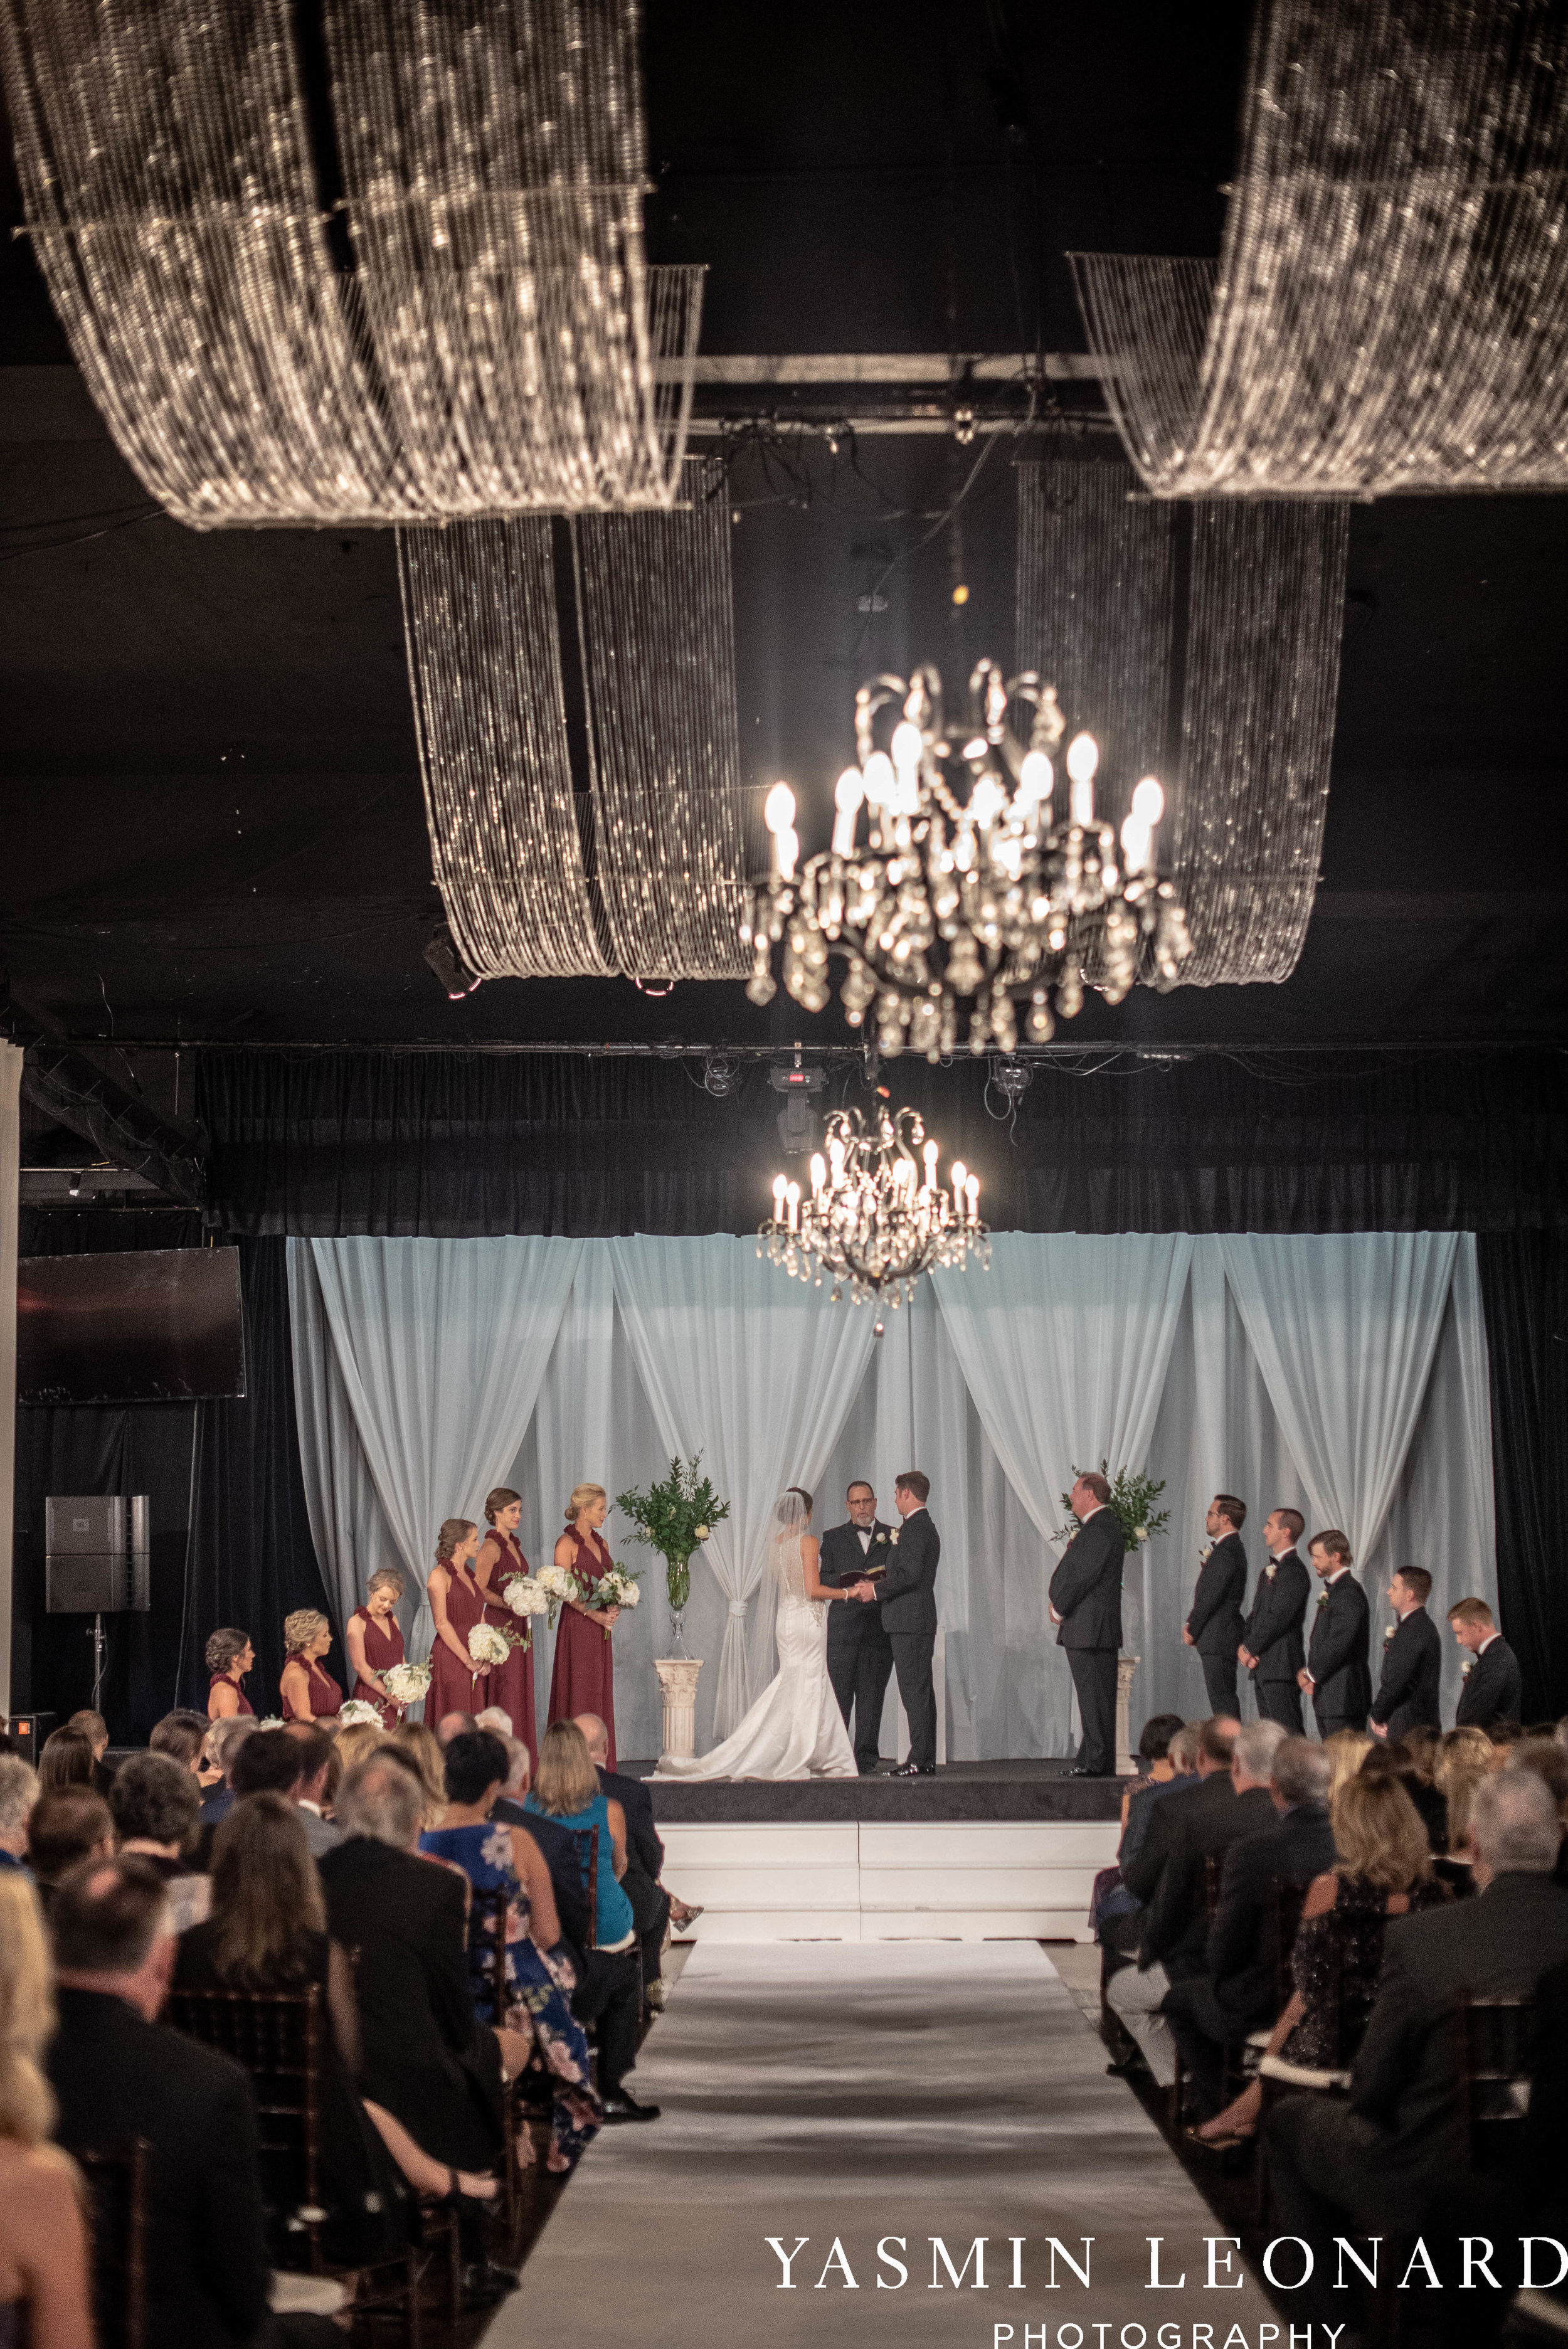 Millennium Center Wedding - Downtown Winston Salem - Winston Salem Wedding Photographer - Winston Salem Venues - Indoor Wedding Venues - NC Wedding Photographer - Yasmin Leonard Photography-38.jpg